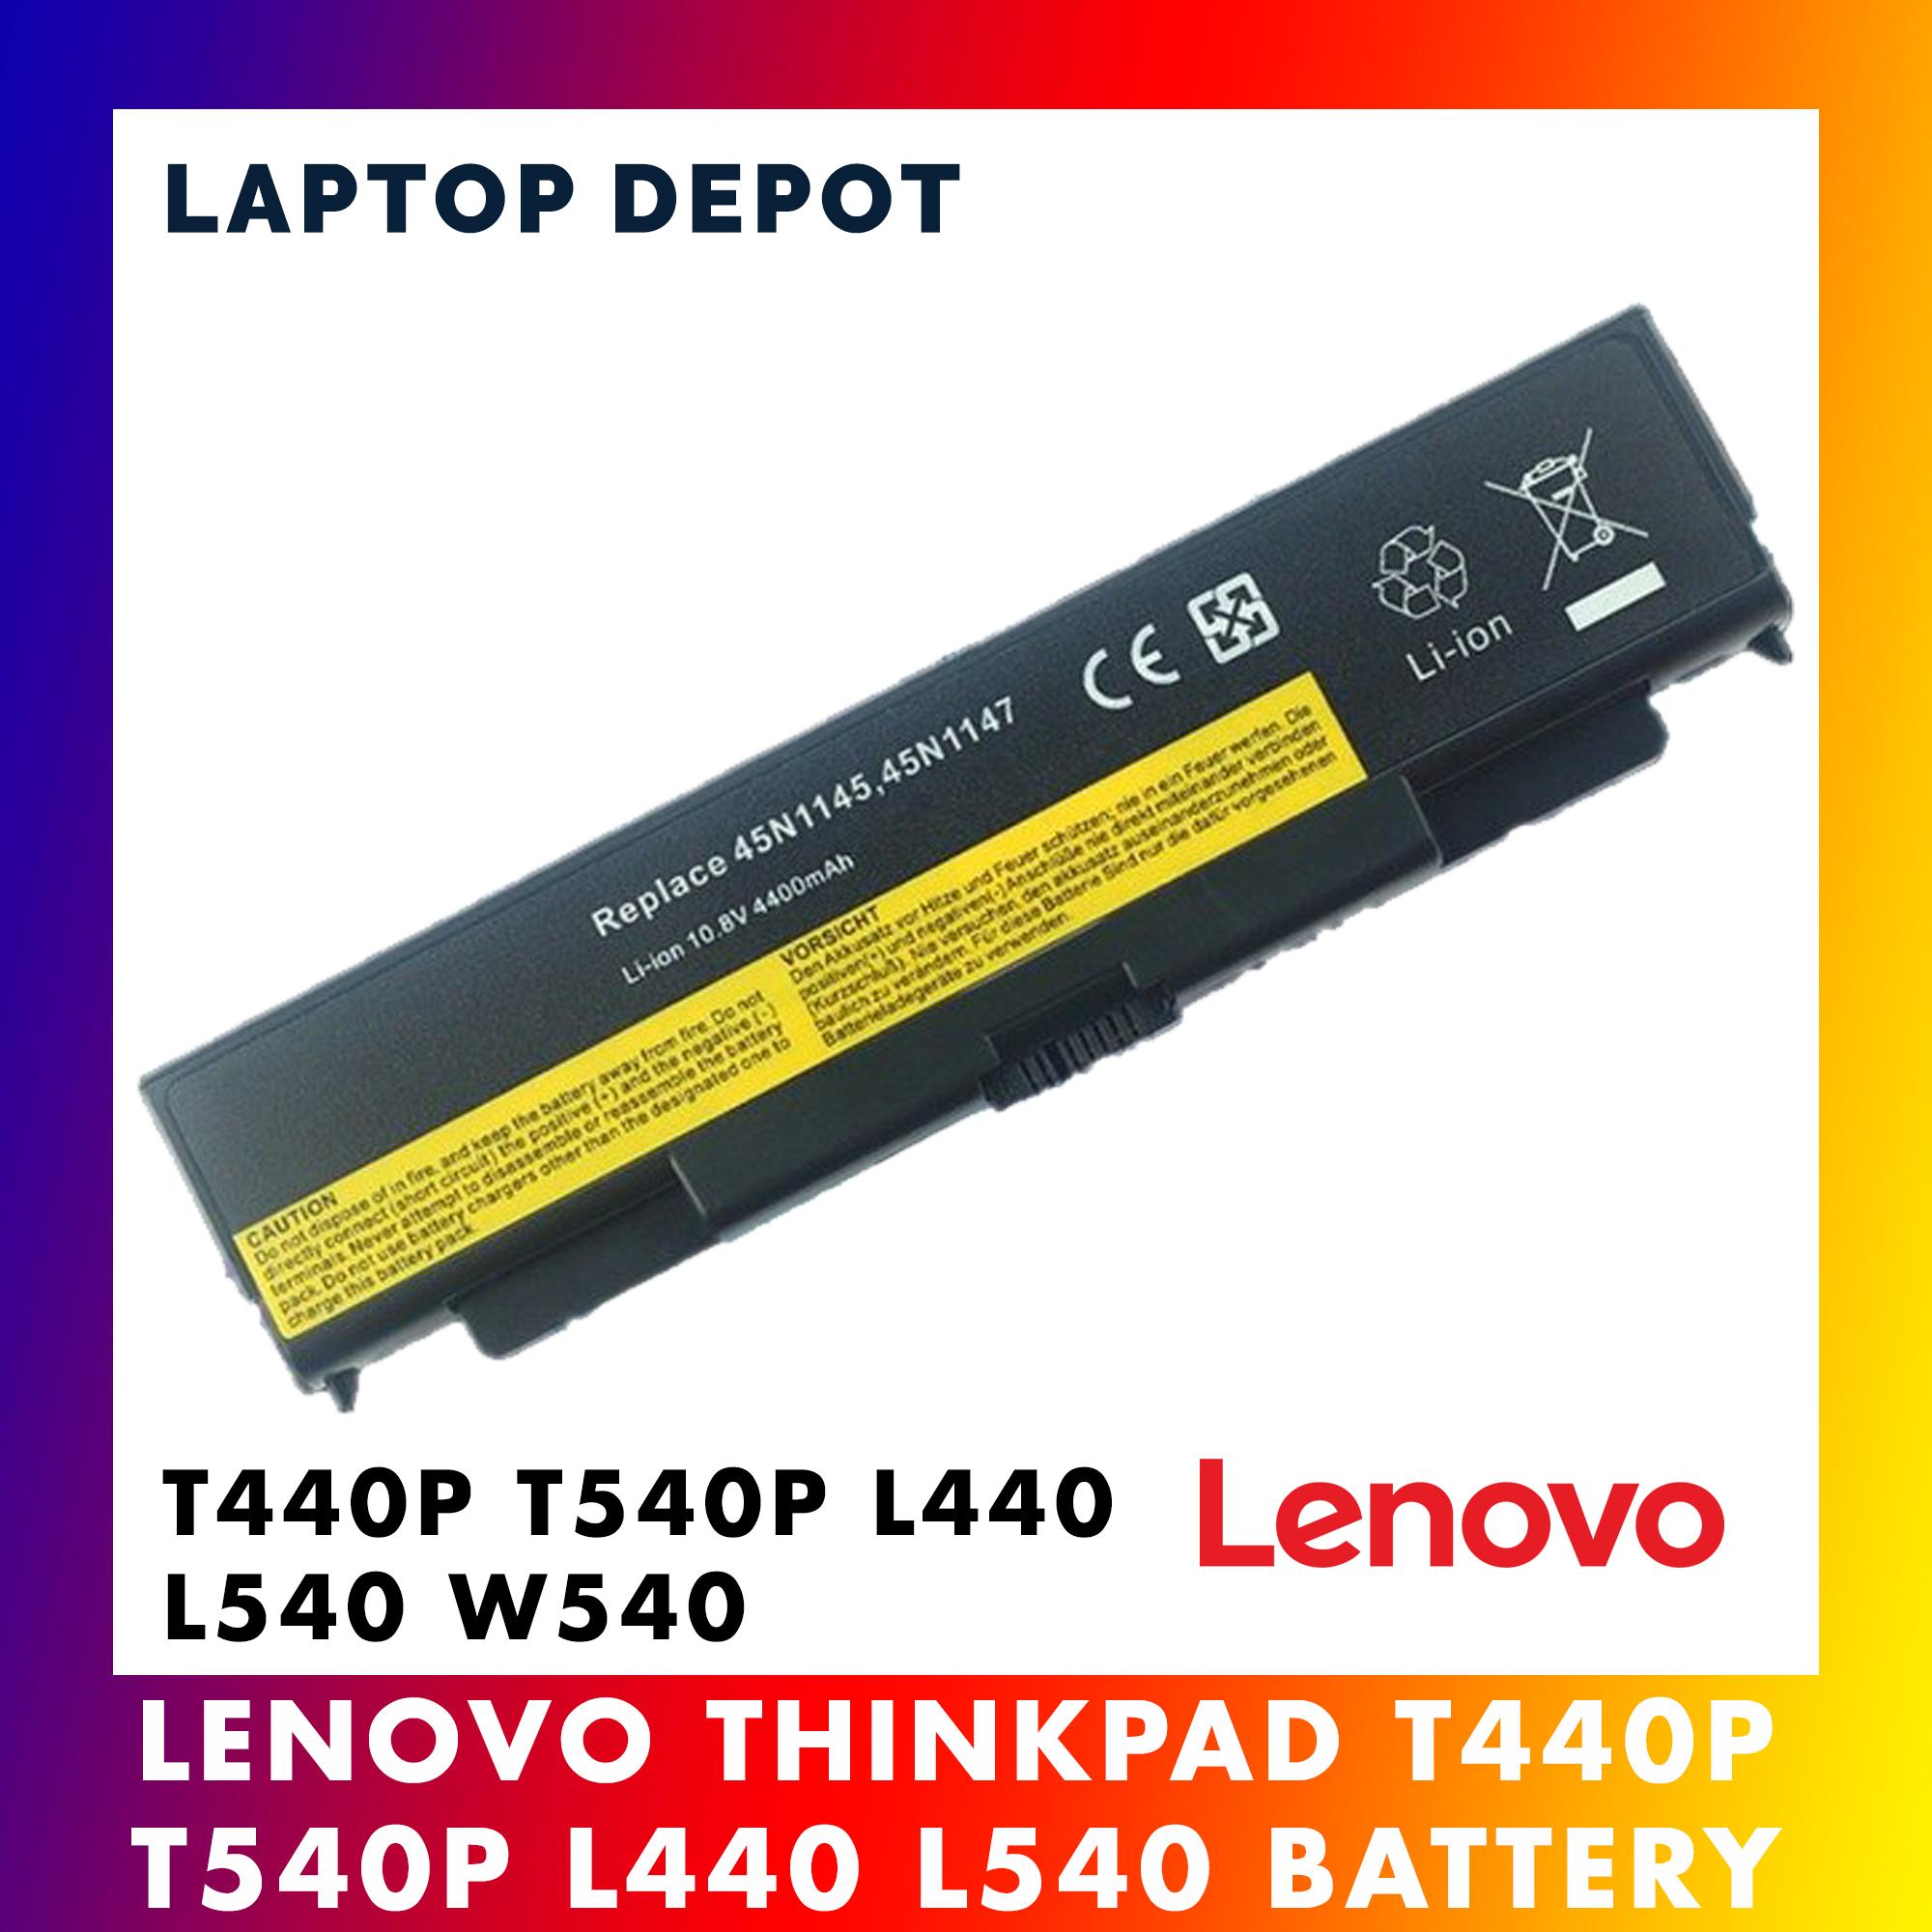 Lenovo ThinkPad T440P T540P W540 45N1144 45N1145 45N1148 Battery